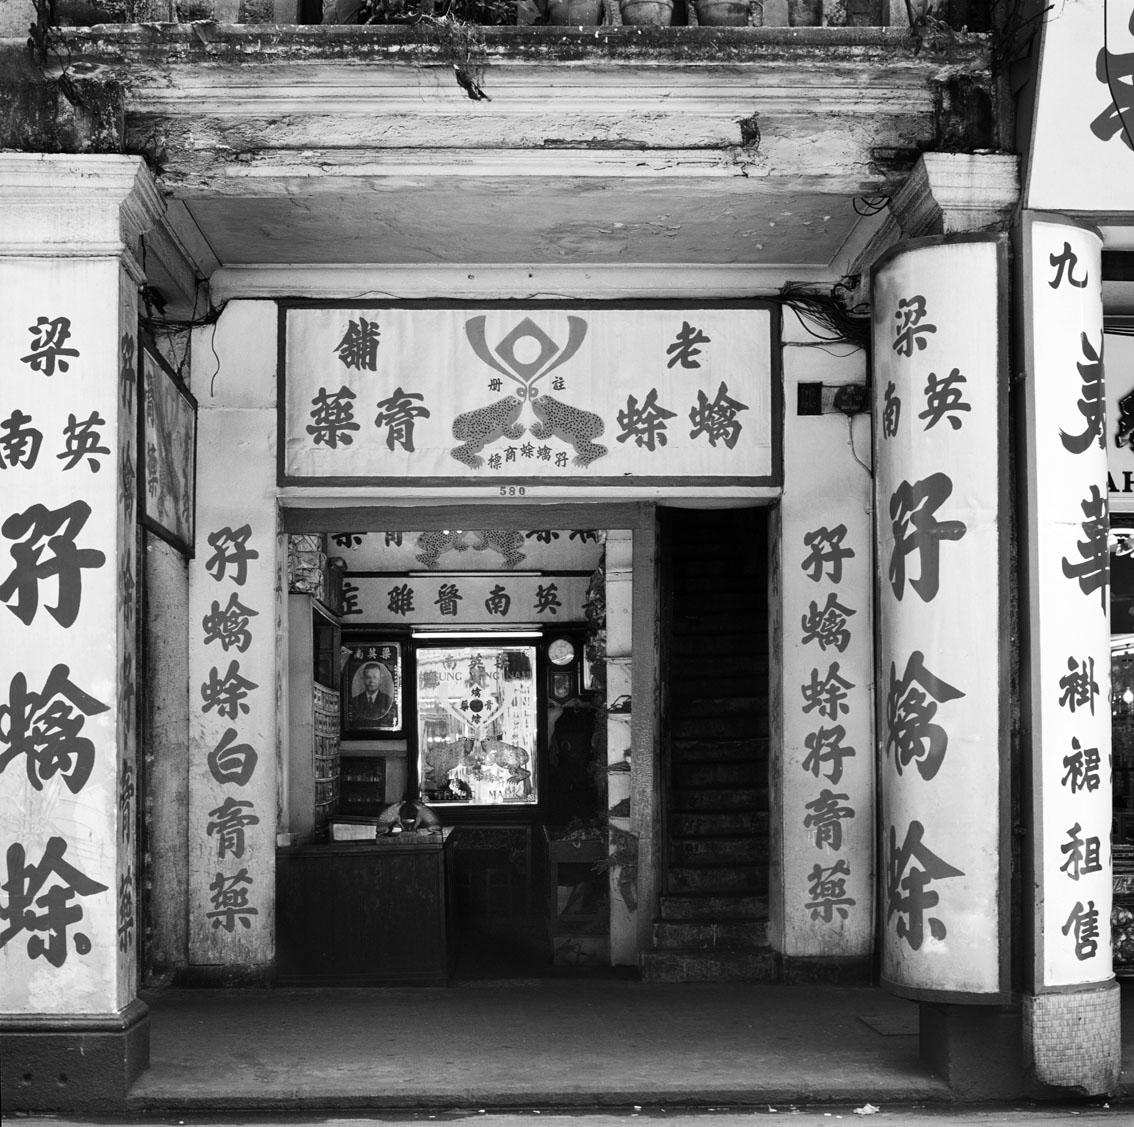 Mong Kok Medicine Shop